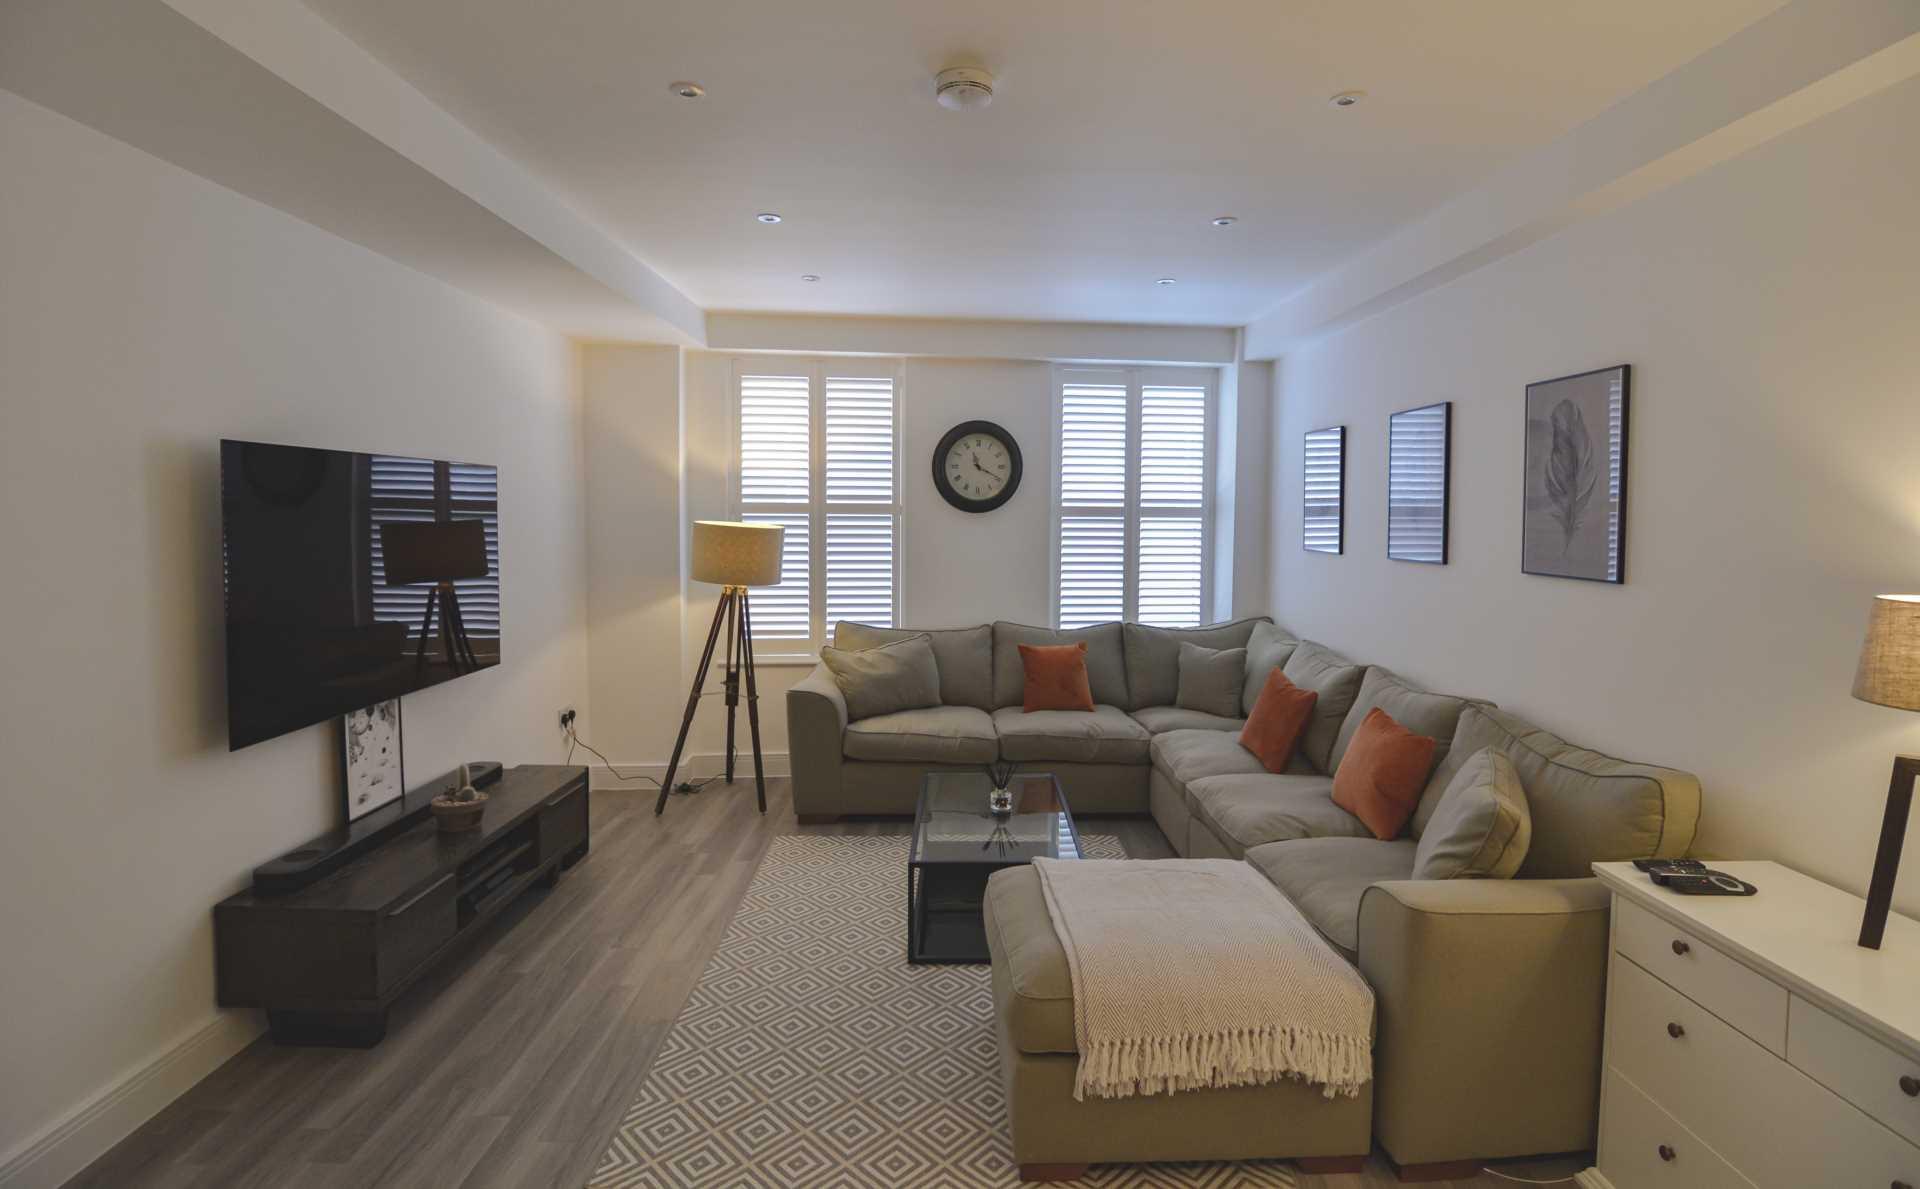 Flat 6, Waterloo Apartments, Image 2